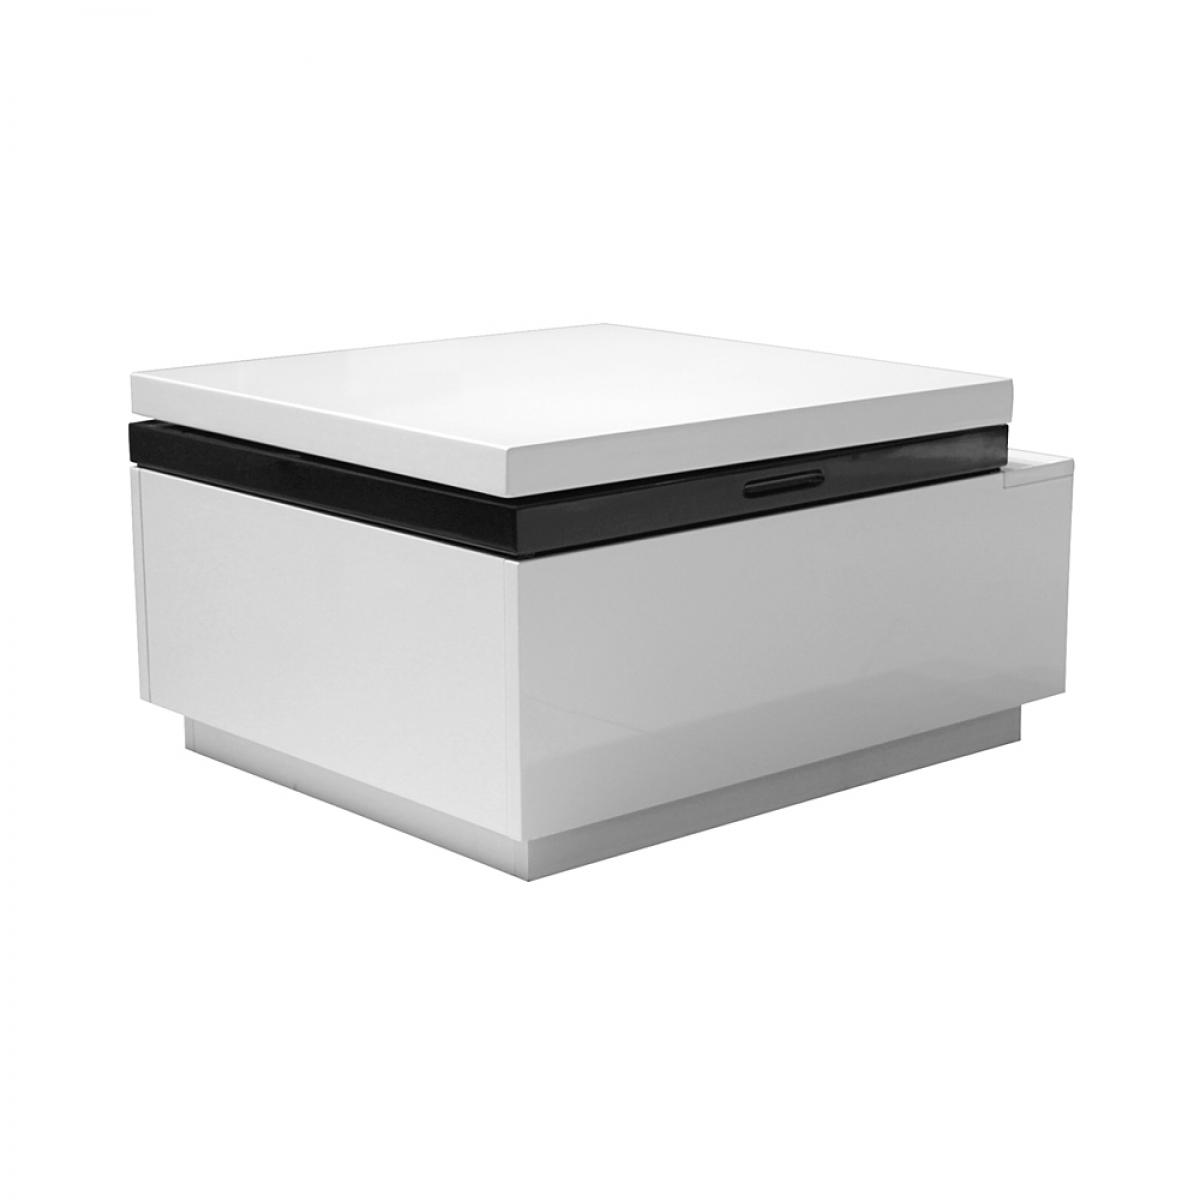 Ligne fabia blanche ubaldi table basse for Petite table basse blanche